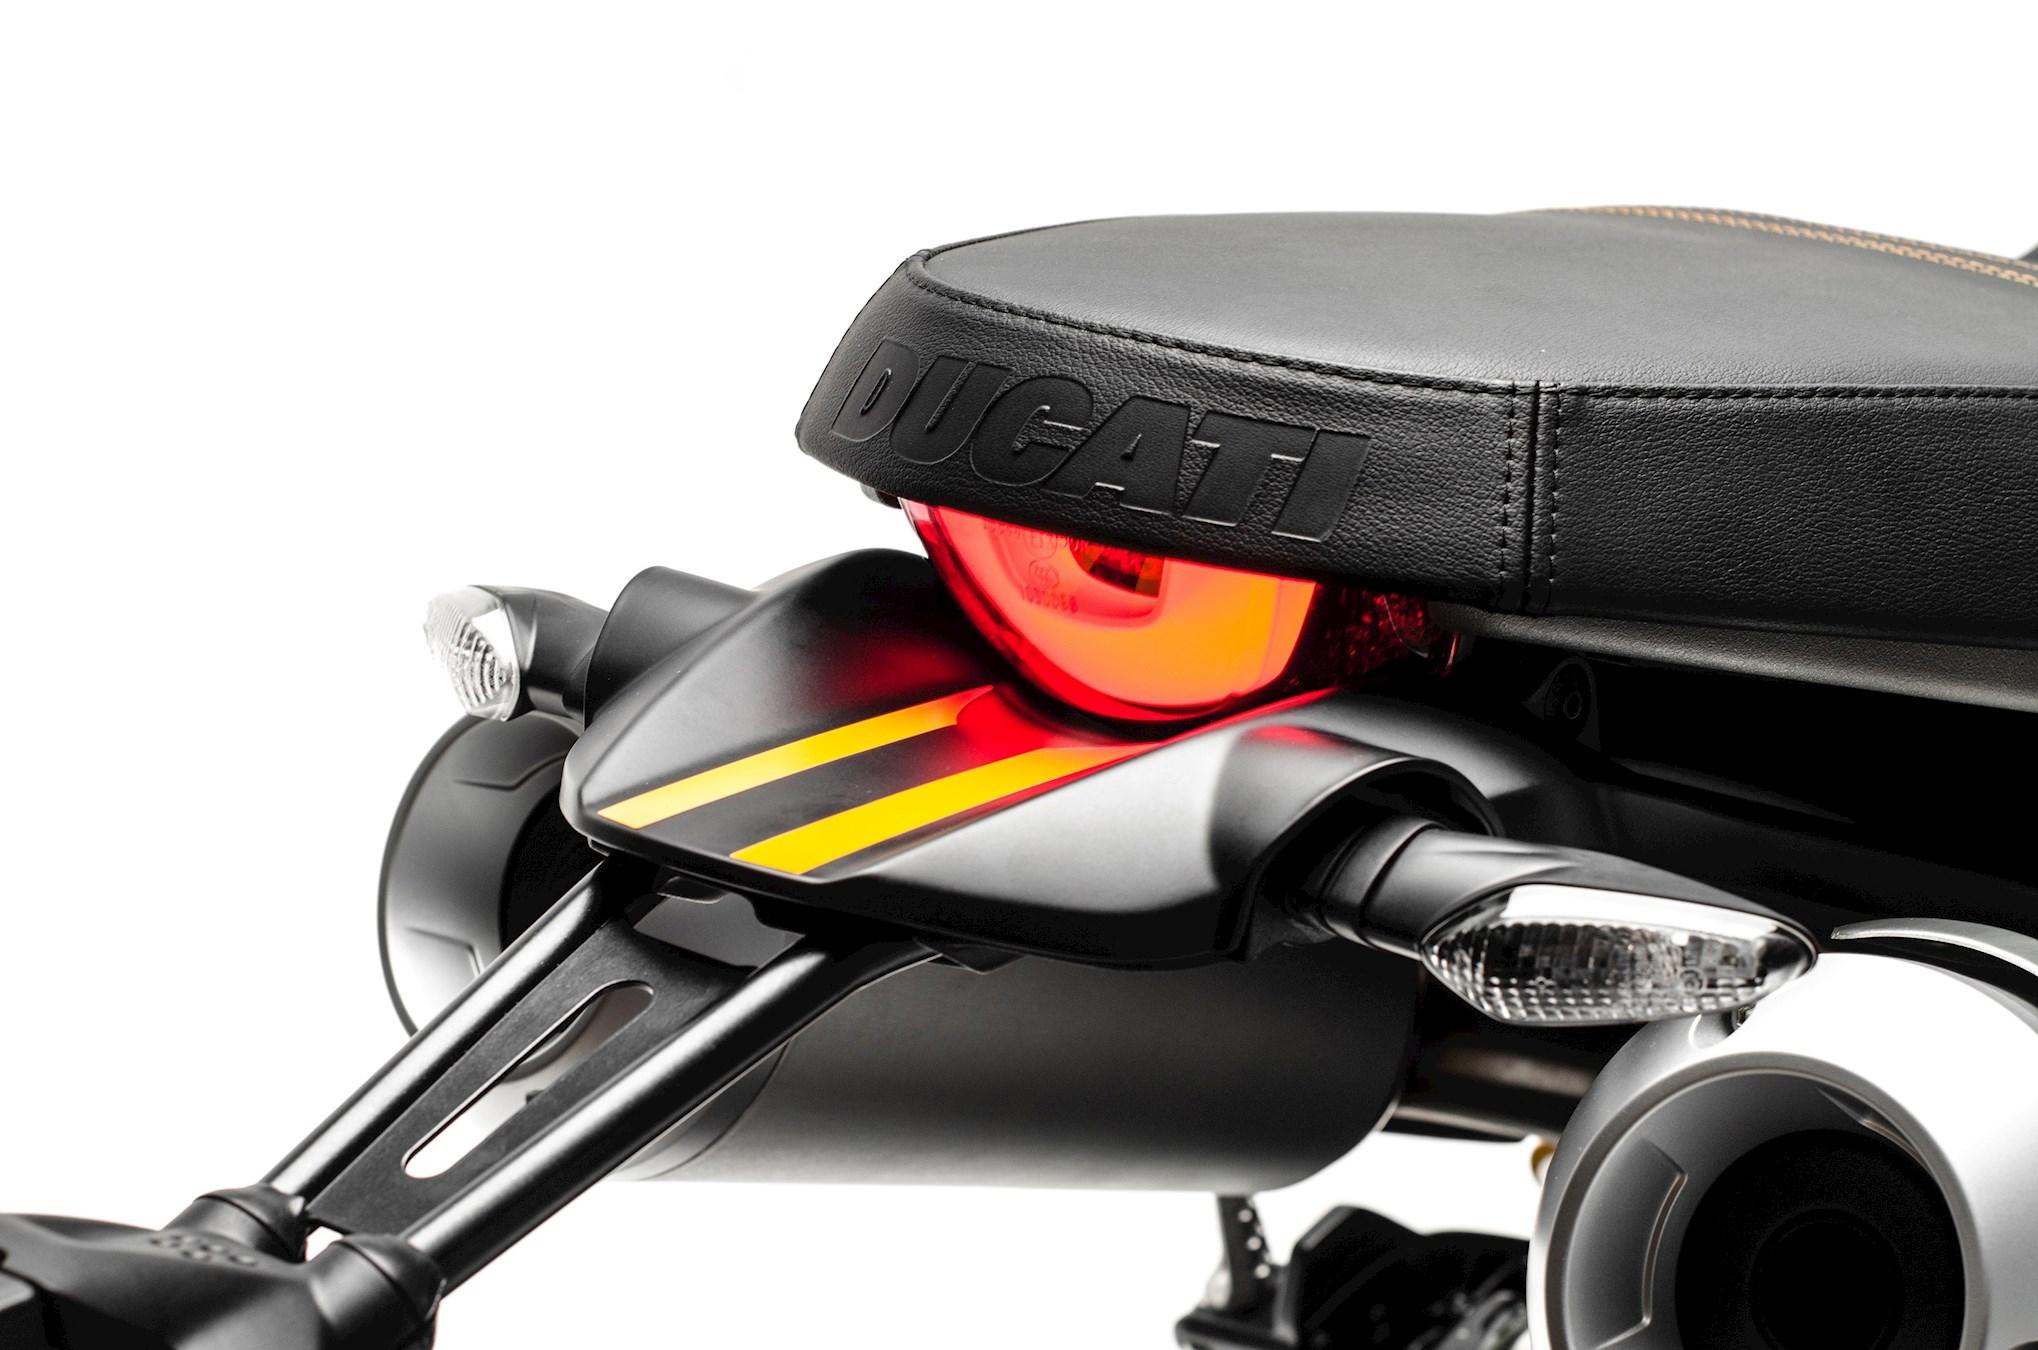 МОТОЦИКЛ DUCATI SCRAMBLER 1100 SPORT ― Артмото - купить квадроцикл в украине и харькове, мотоцикл, снегоход, скутер, мопед, электромобиль